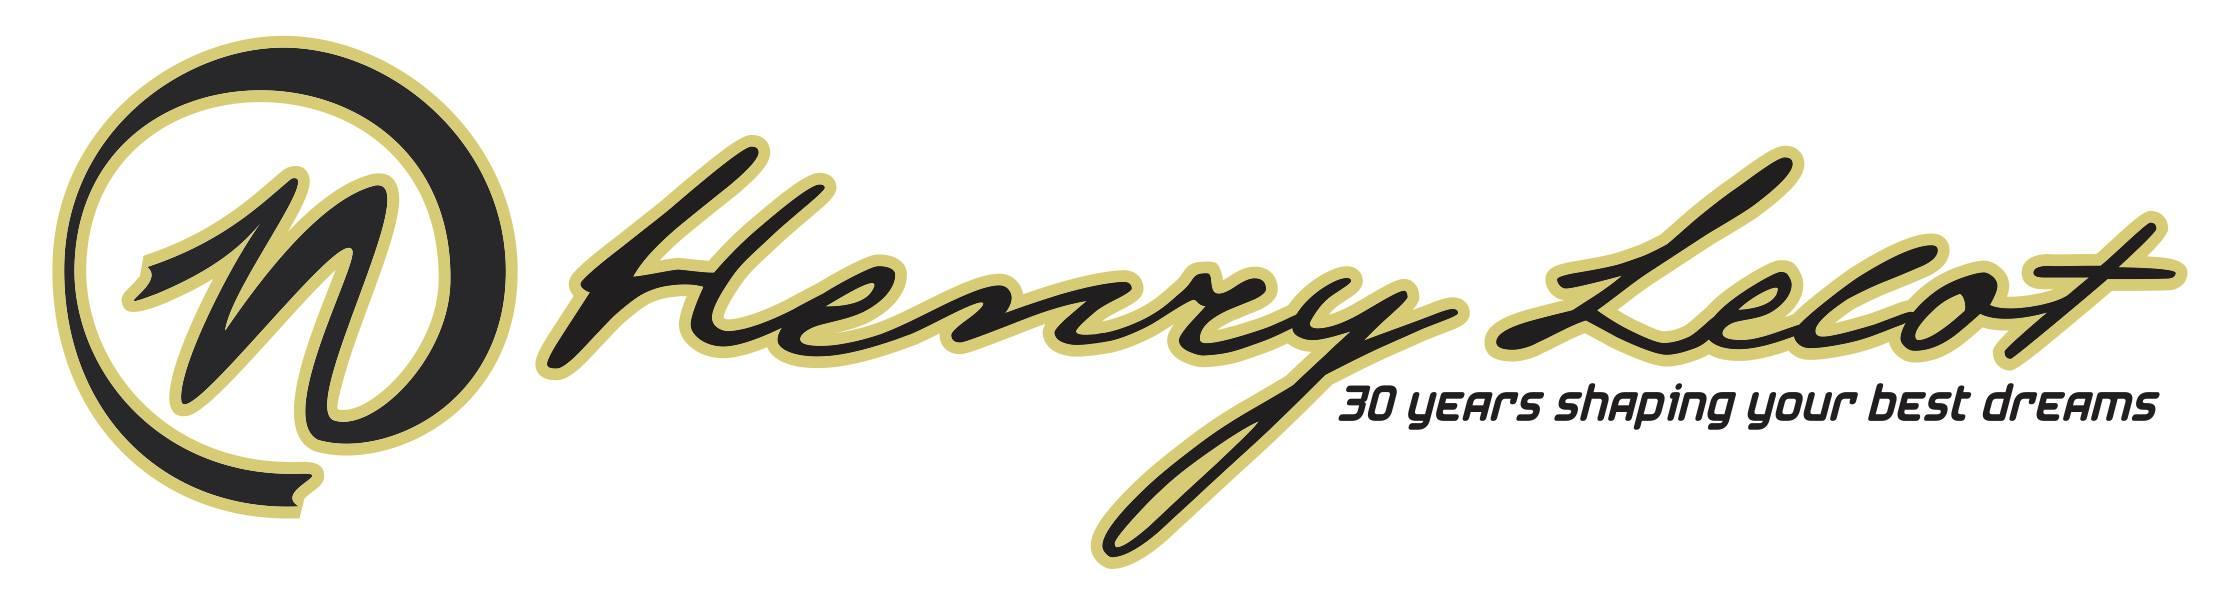 henry lelot signature